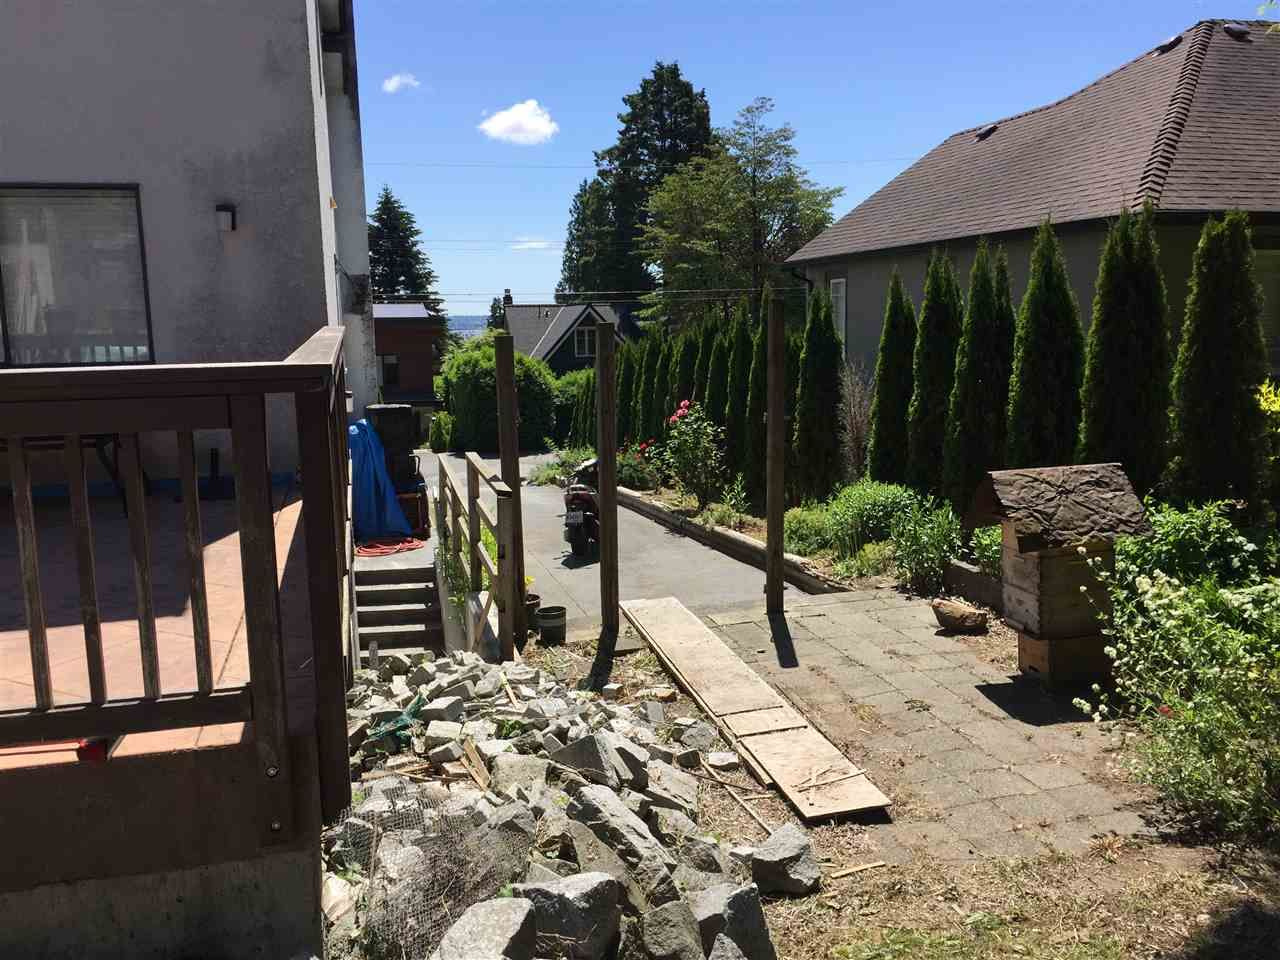 Photo 3: Photos: 1507 JEFFERSON AVENUE in West Vancouver: Ambleside House for sale : MLS®# R2274486